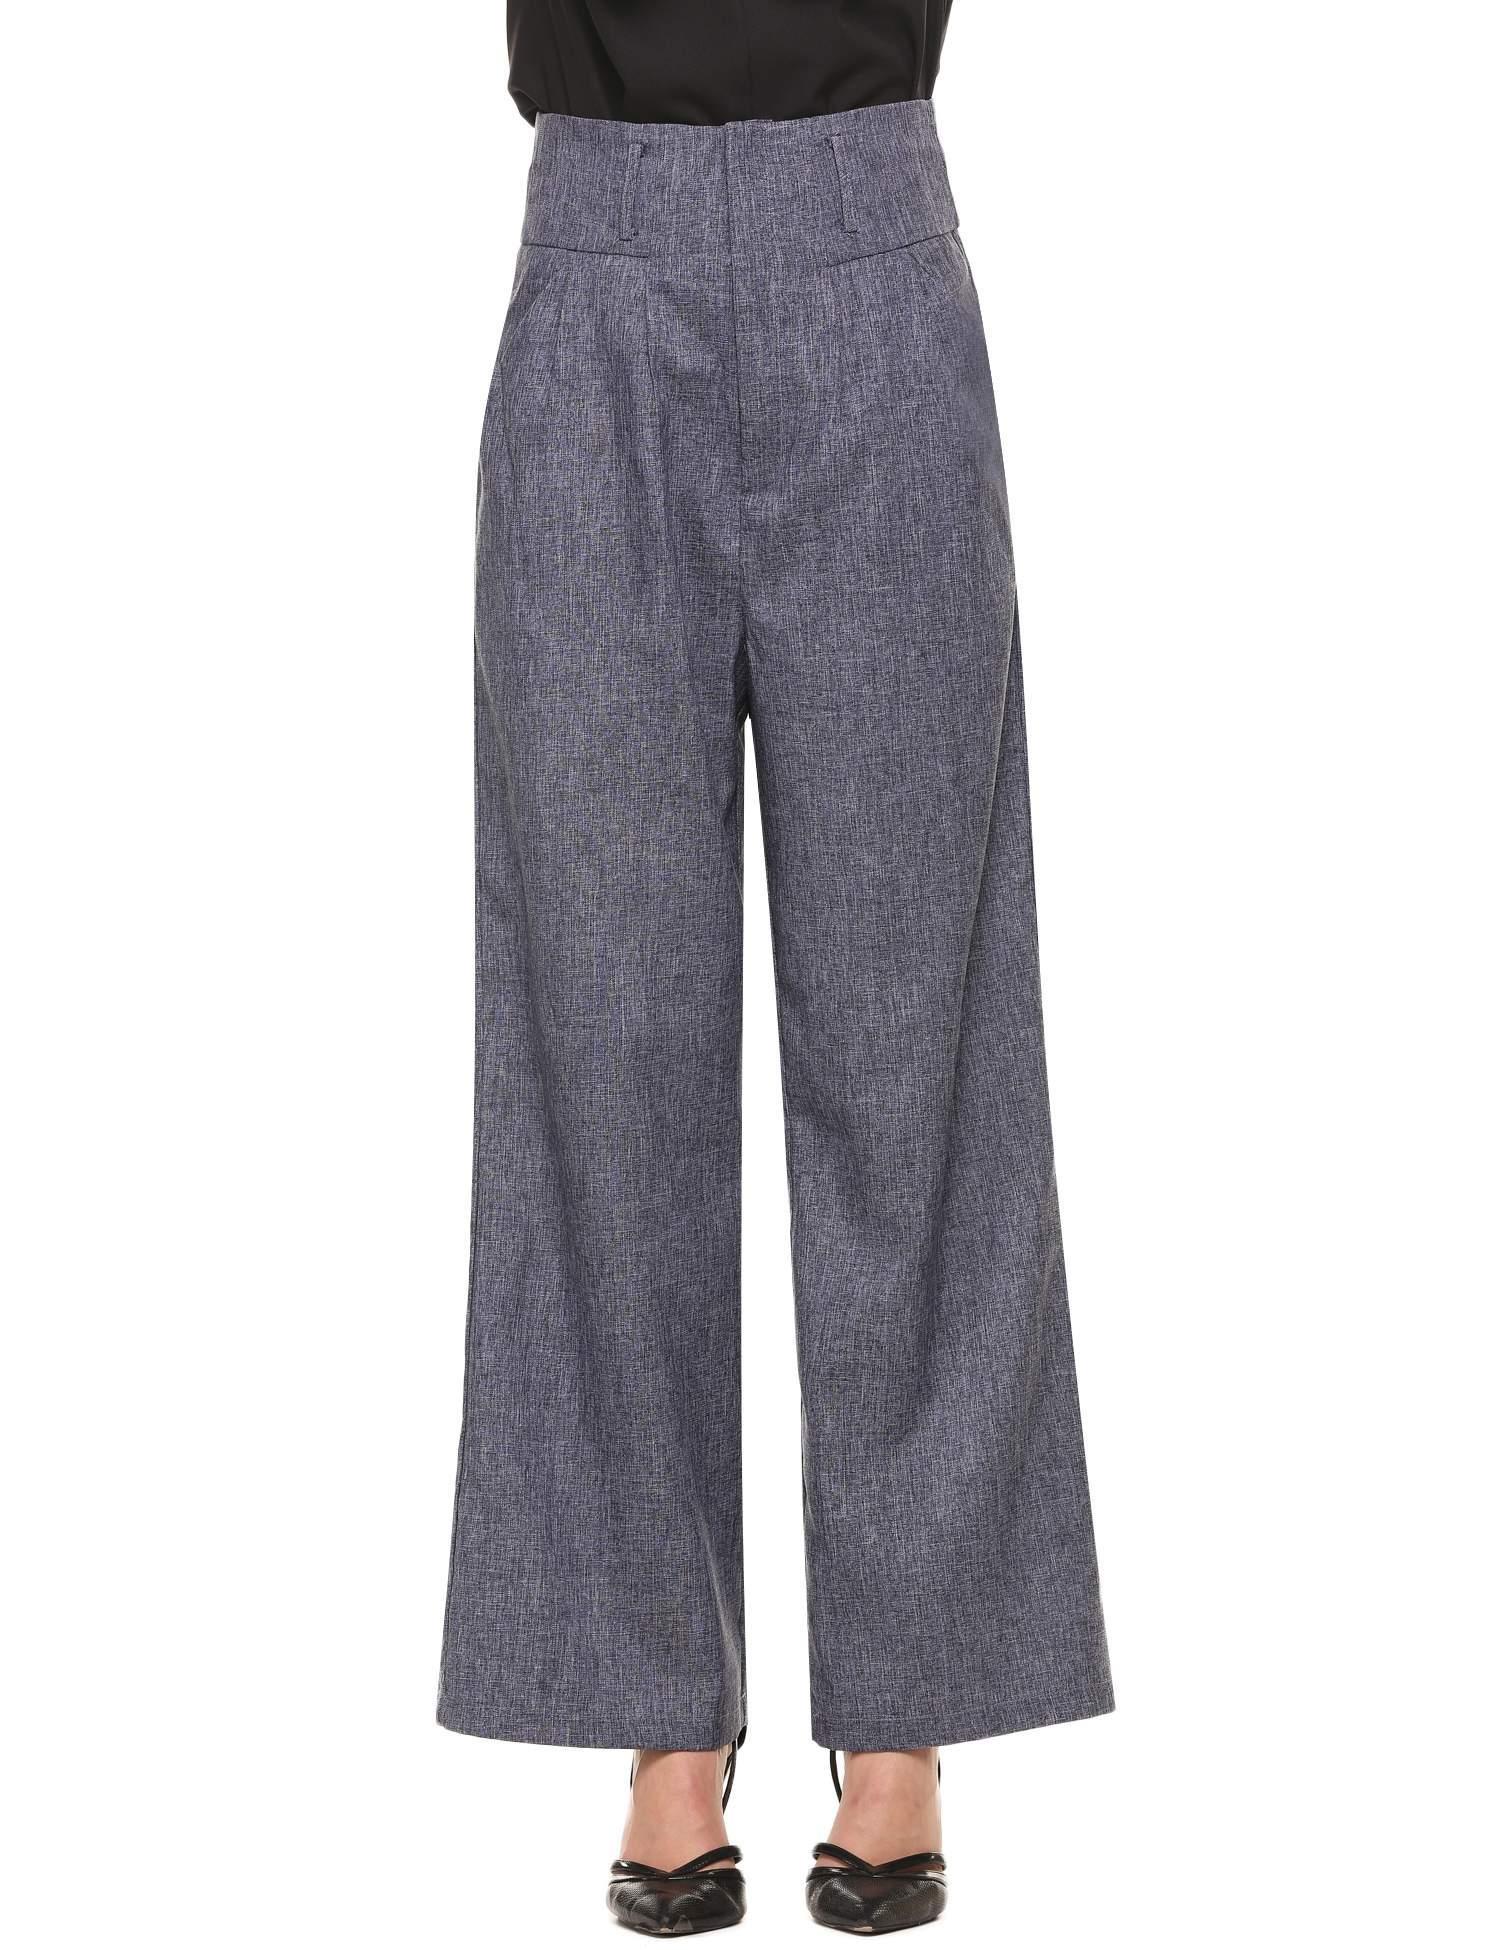 Zeagoo Women High Waist Pants Wide Flare Leg Style (Small, Blue)